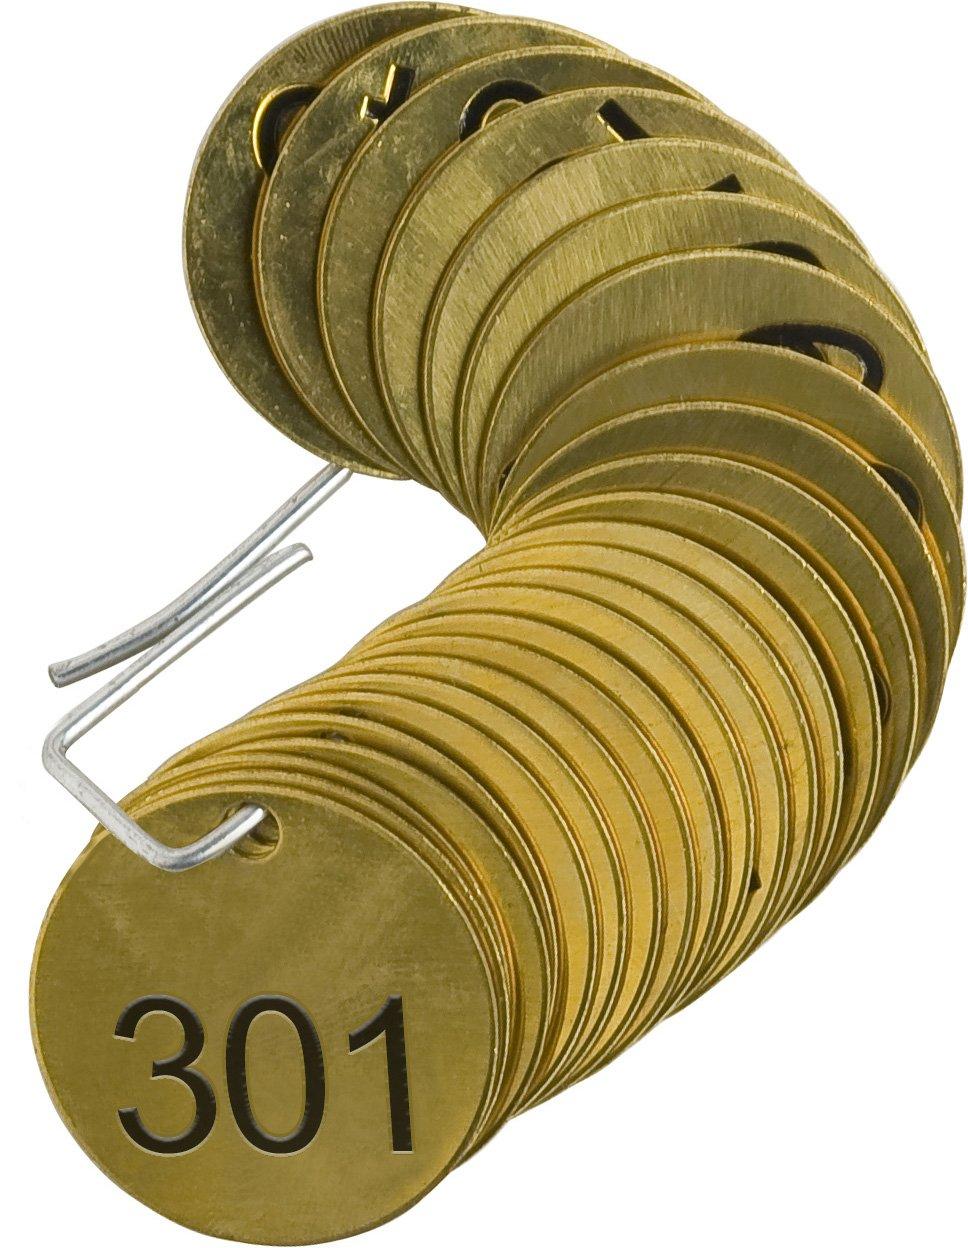 Brady 236191 1/2'' Diameter Stamped Brass Valve Tags, Numbers 301-325, Legend''(Blank)'' (25 per Package)